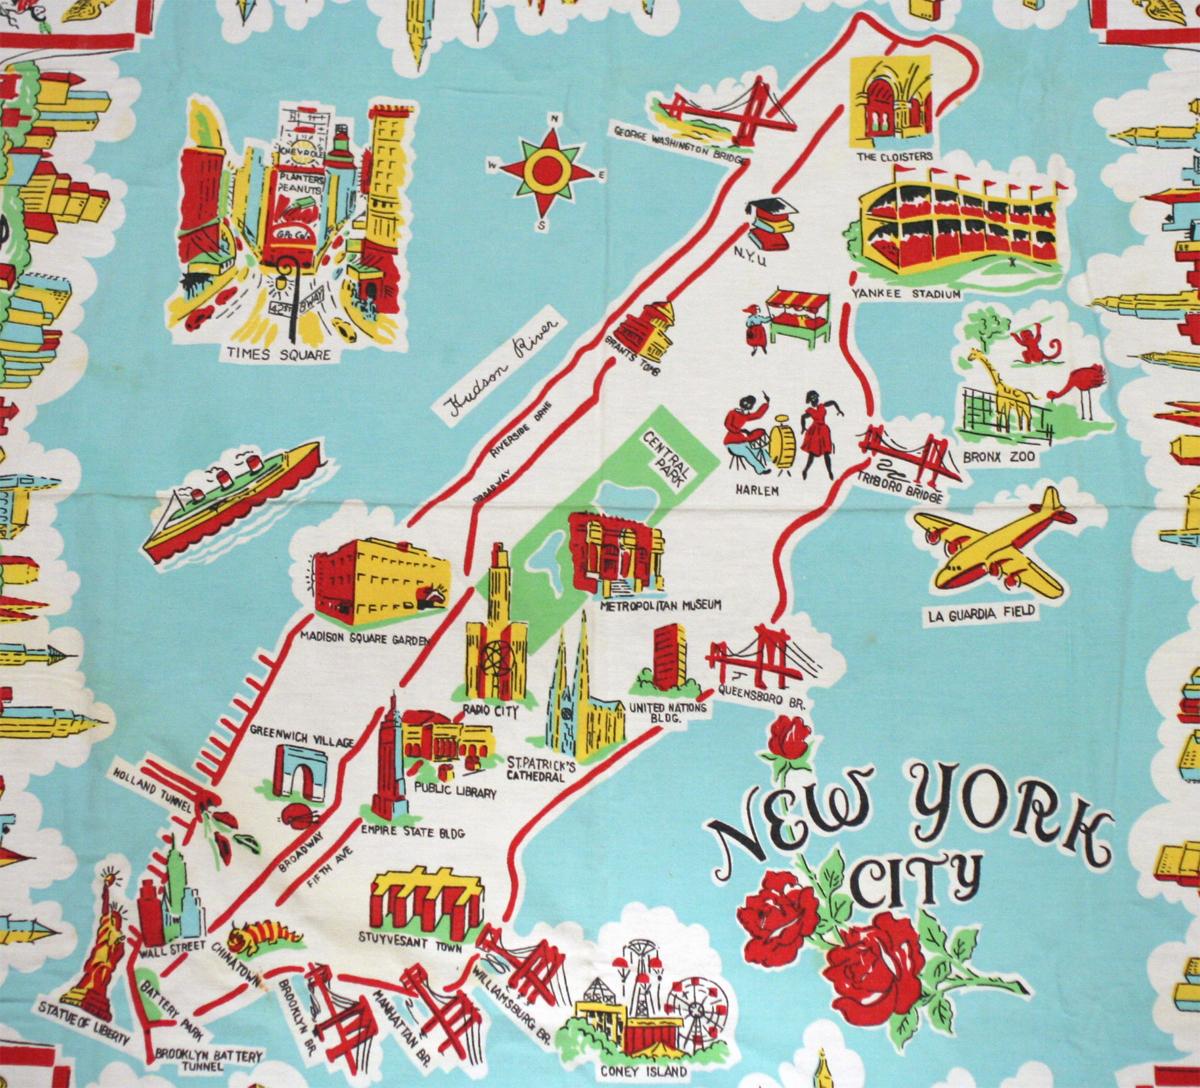 York Tourist Map Pdf New york city tourist map pdf